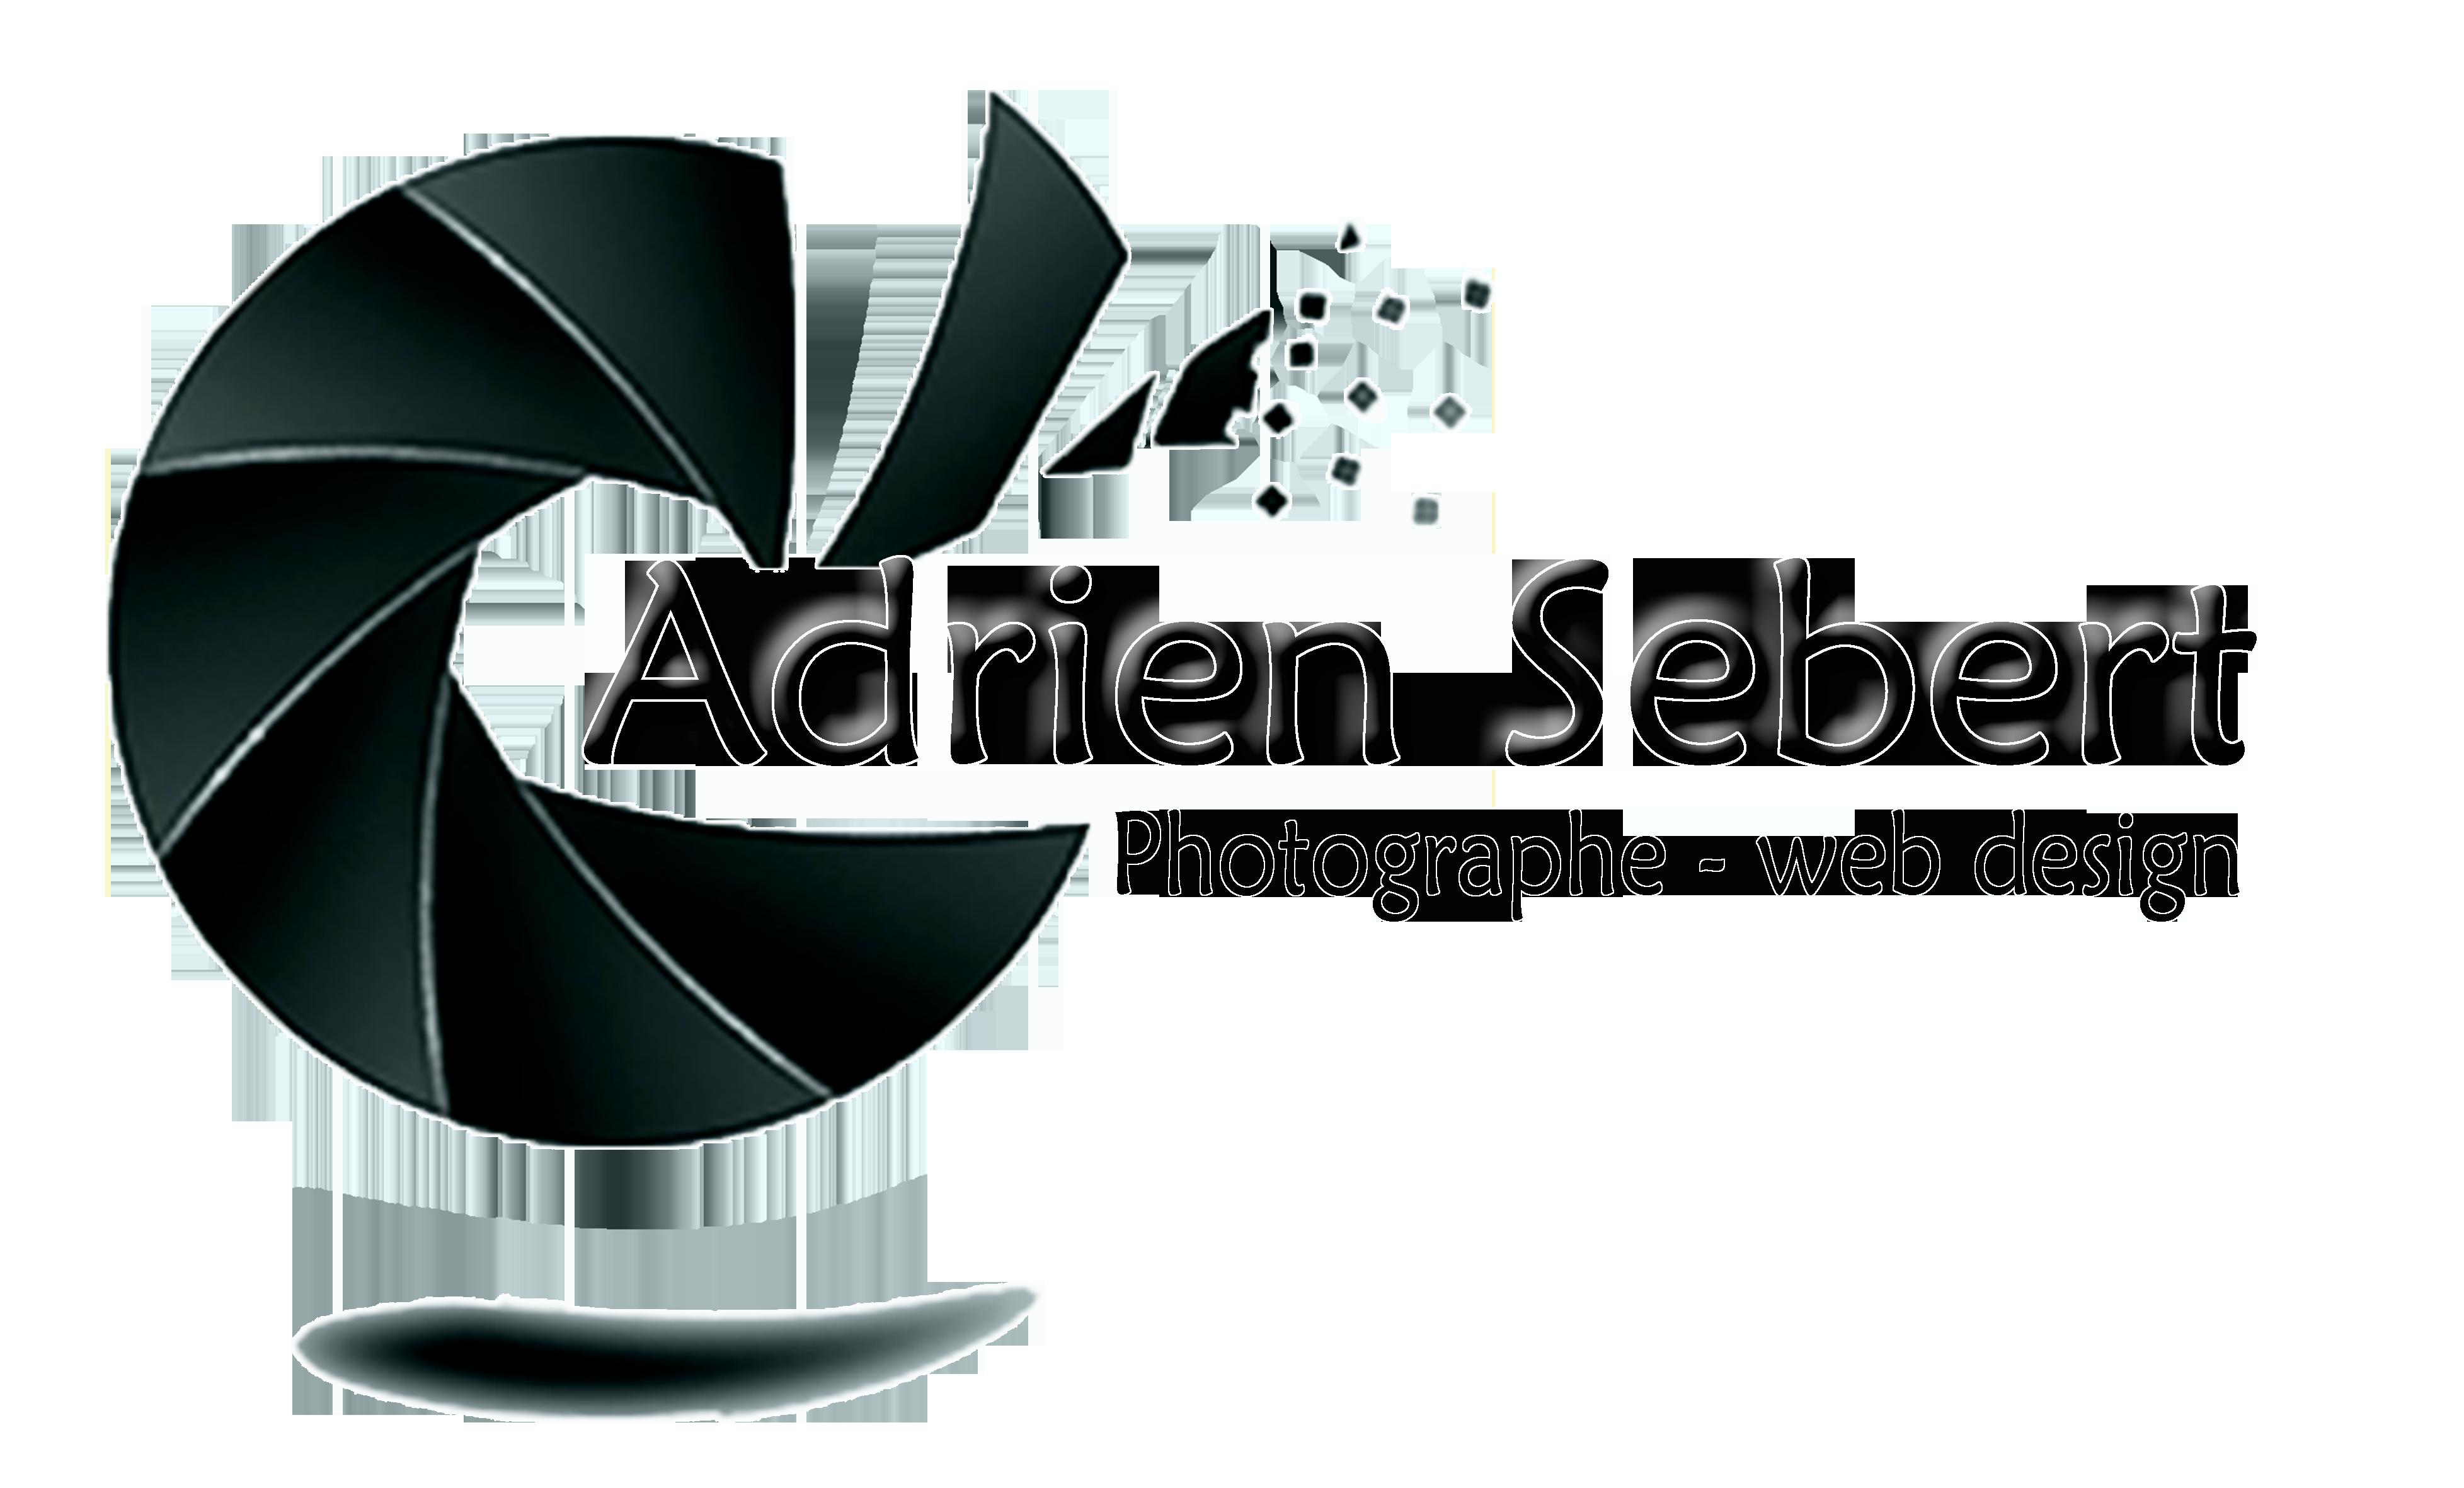 Adrien Sebert Photographe